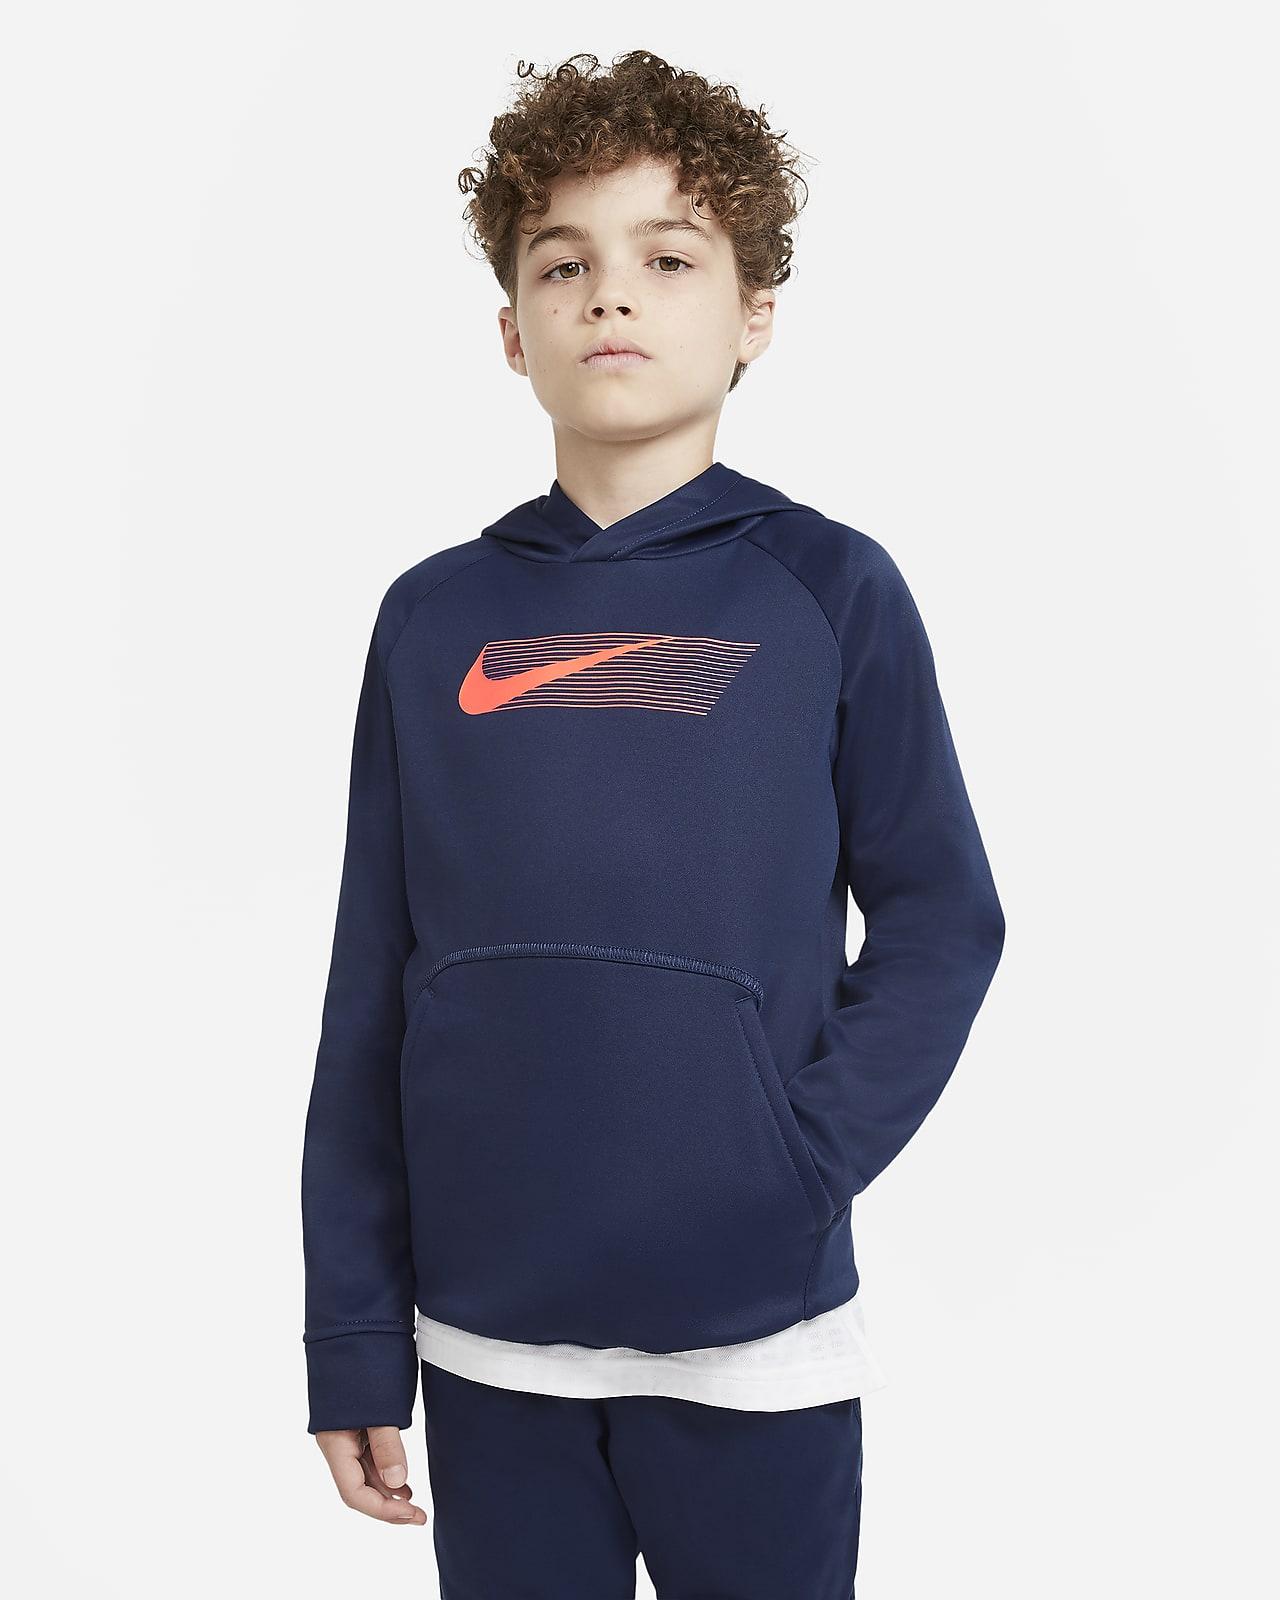 Nike Therma Big Kids' (Boys') Pullover Graphic Training Hoodie